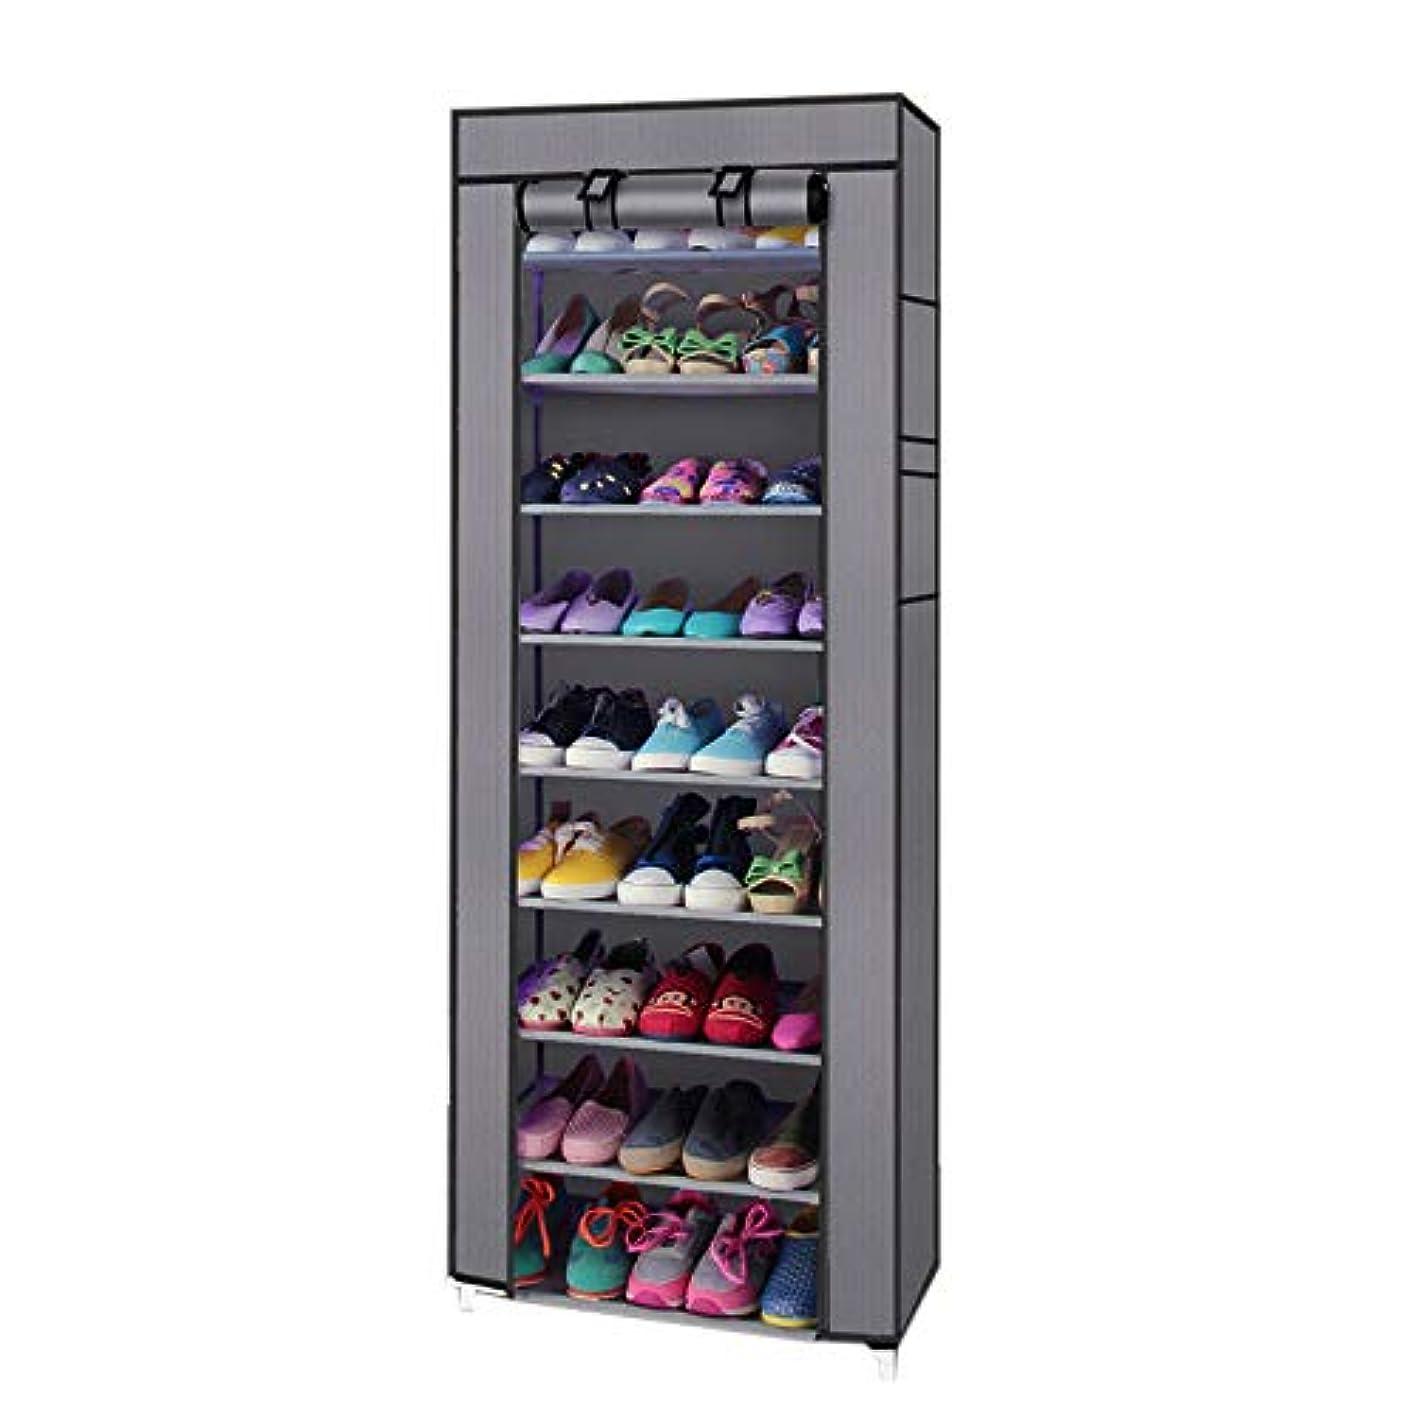 BYF 10 Layer 9 Grid Shoe Rack Shelf Storage Closet Organizer Cabinet Portable Gray